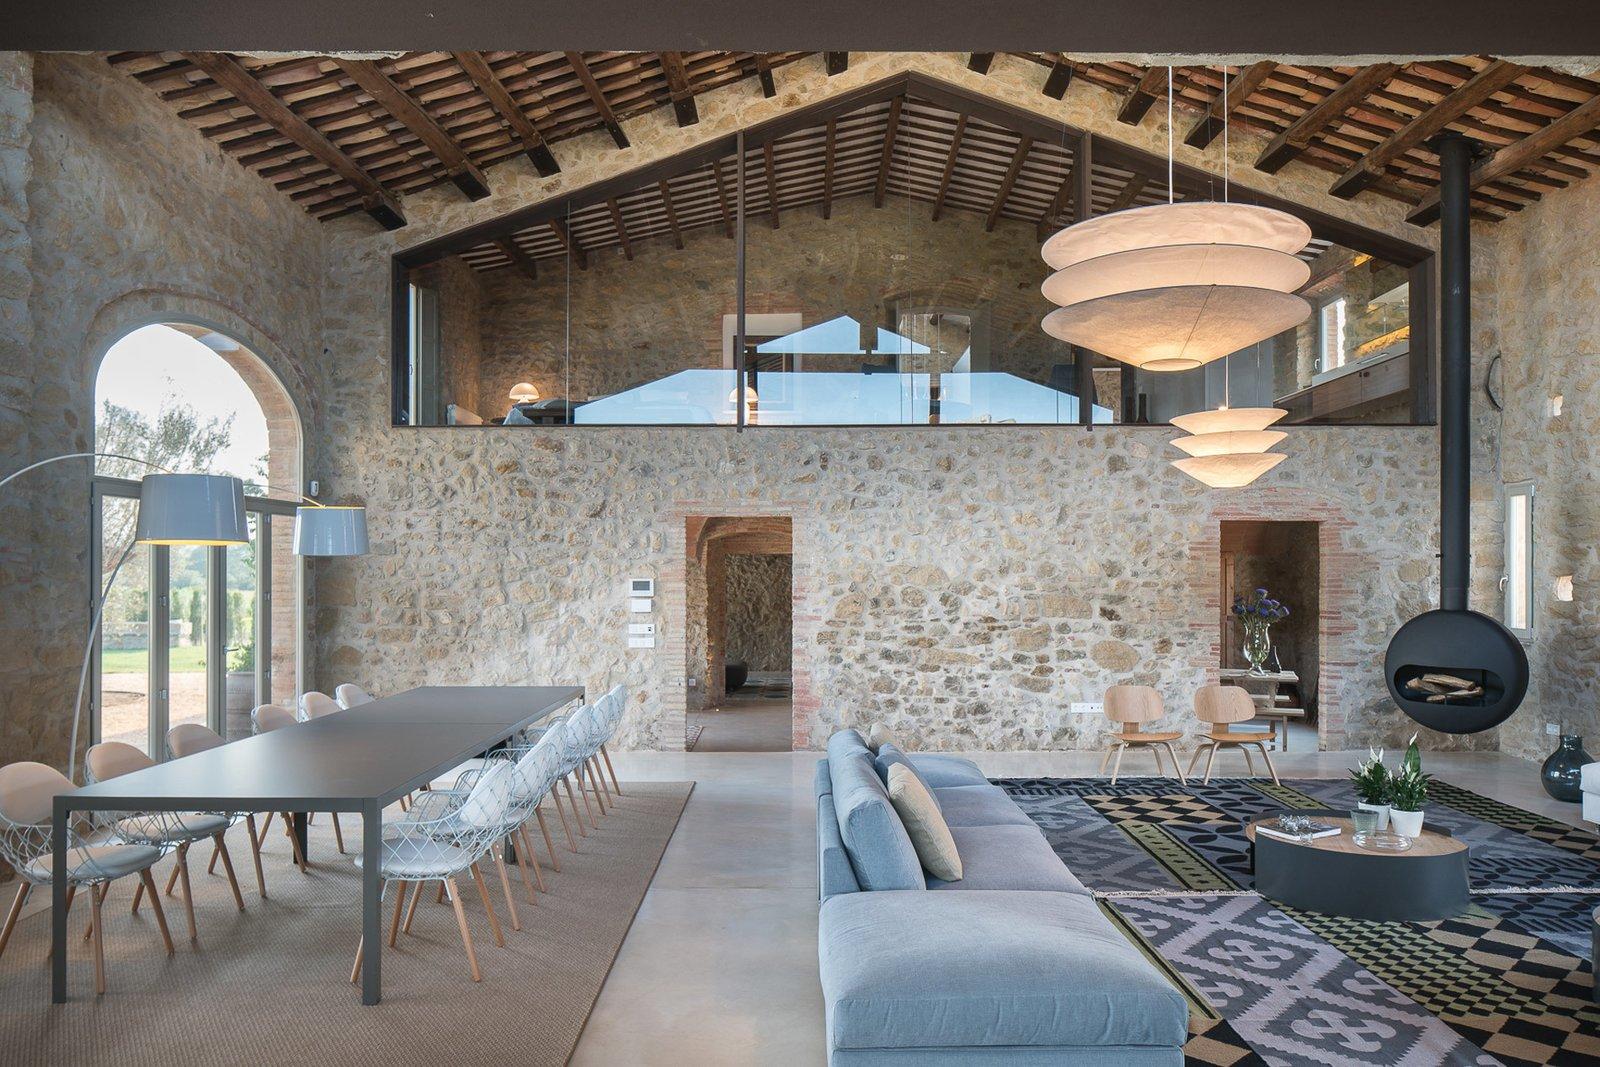 Photo 3 of 14 in Farmhouse In Girona, Spain